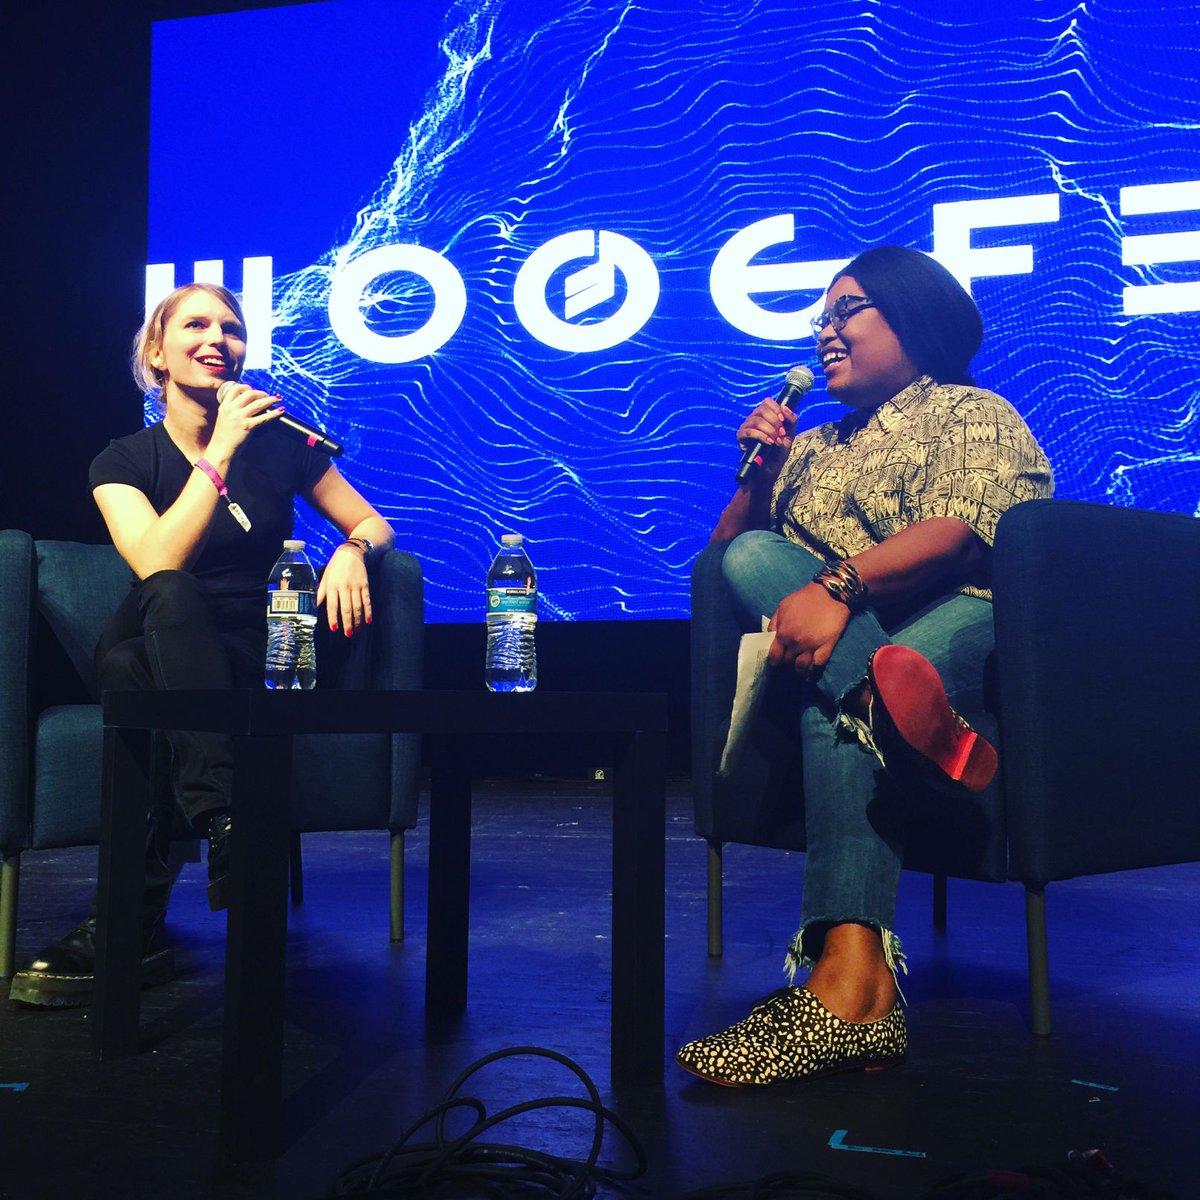 Moogfest 2020